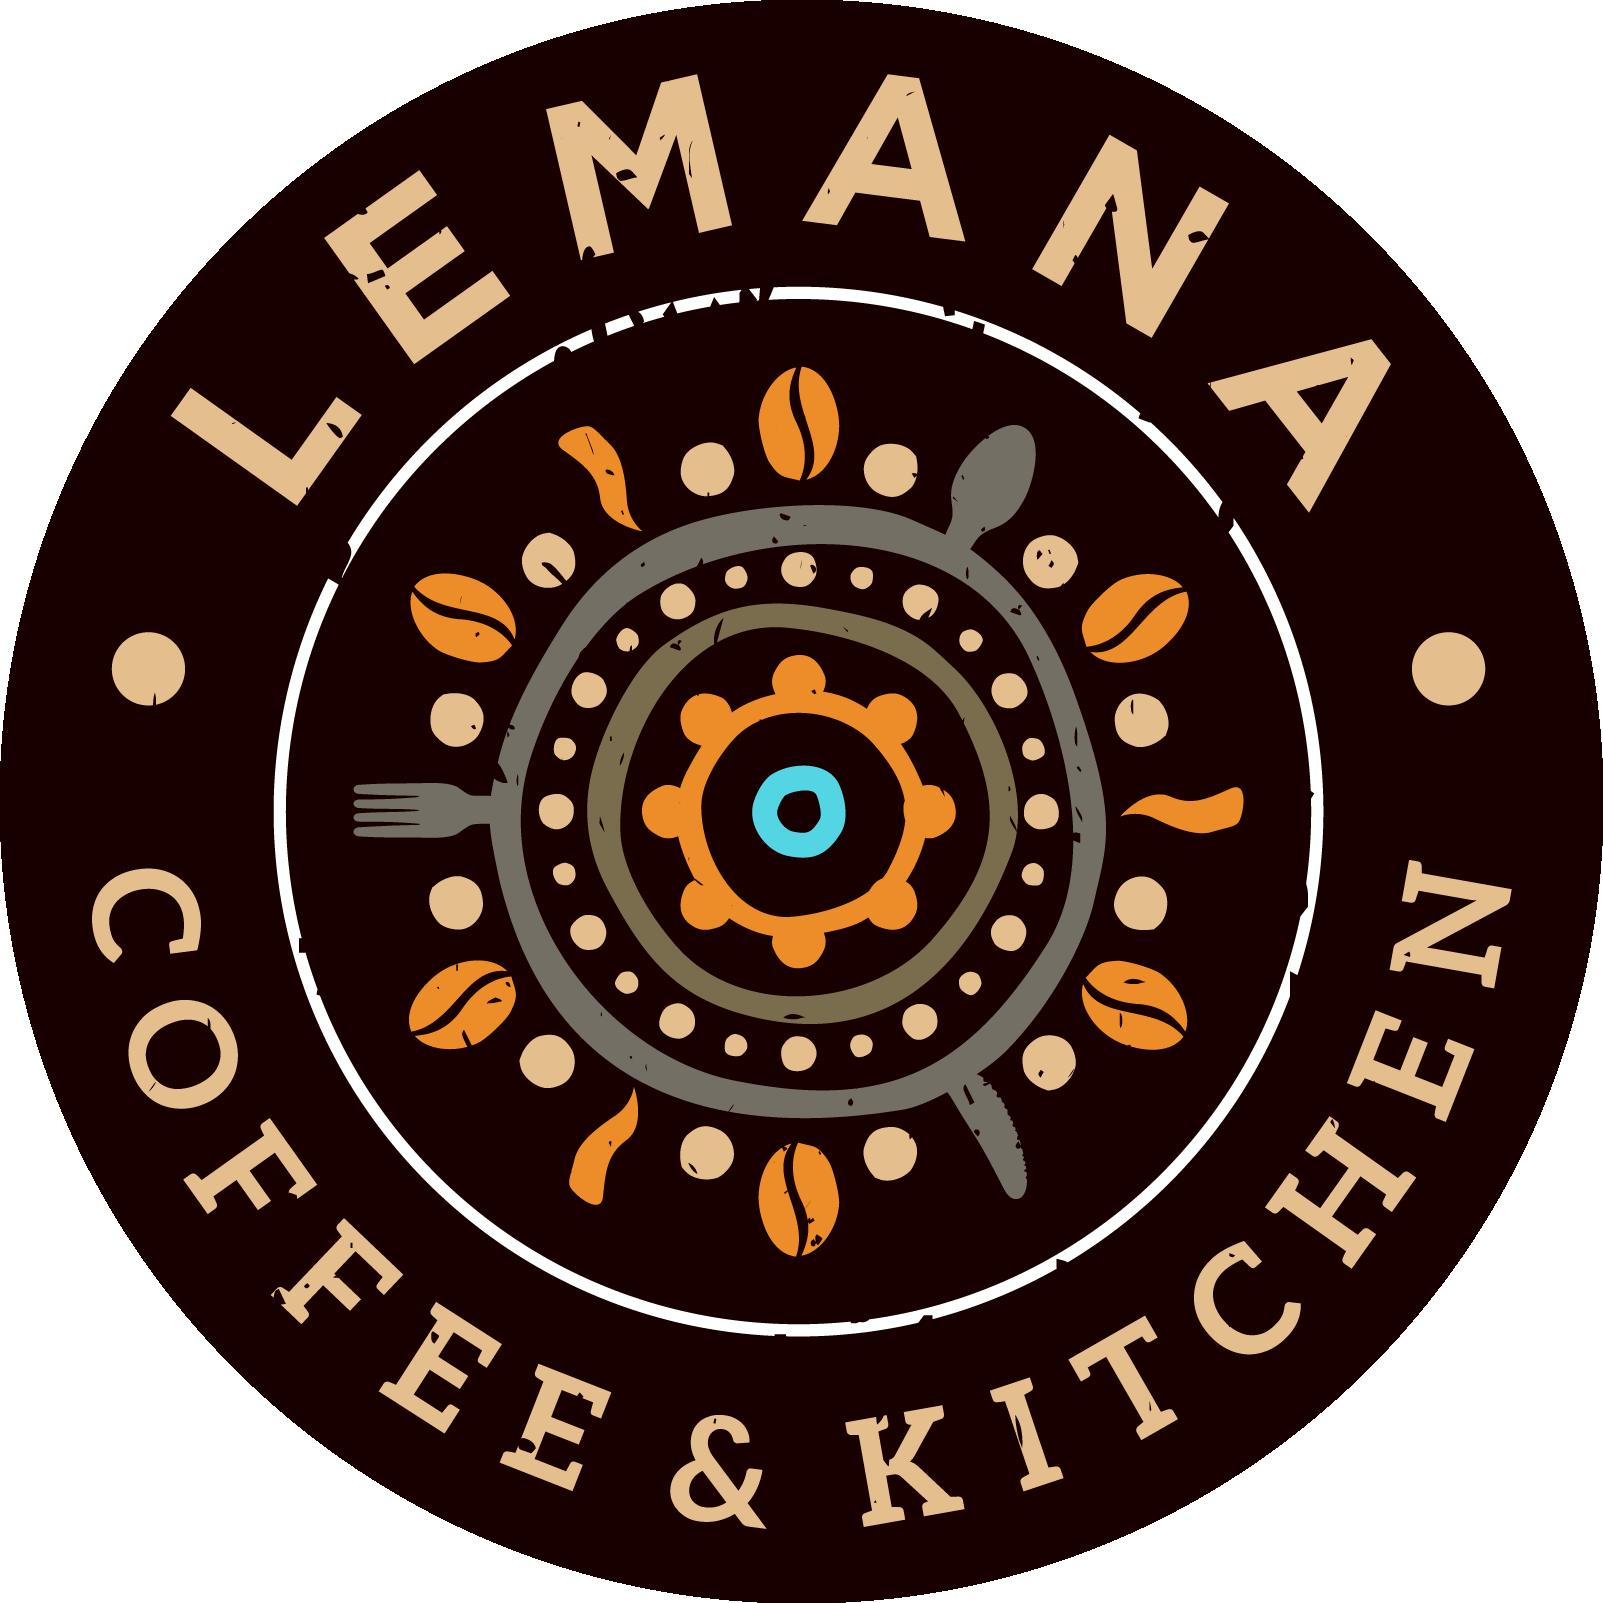 LEMANA COFFEE & KITCHEN